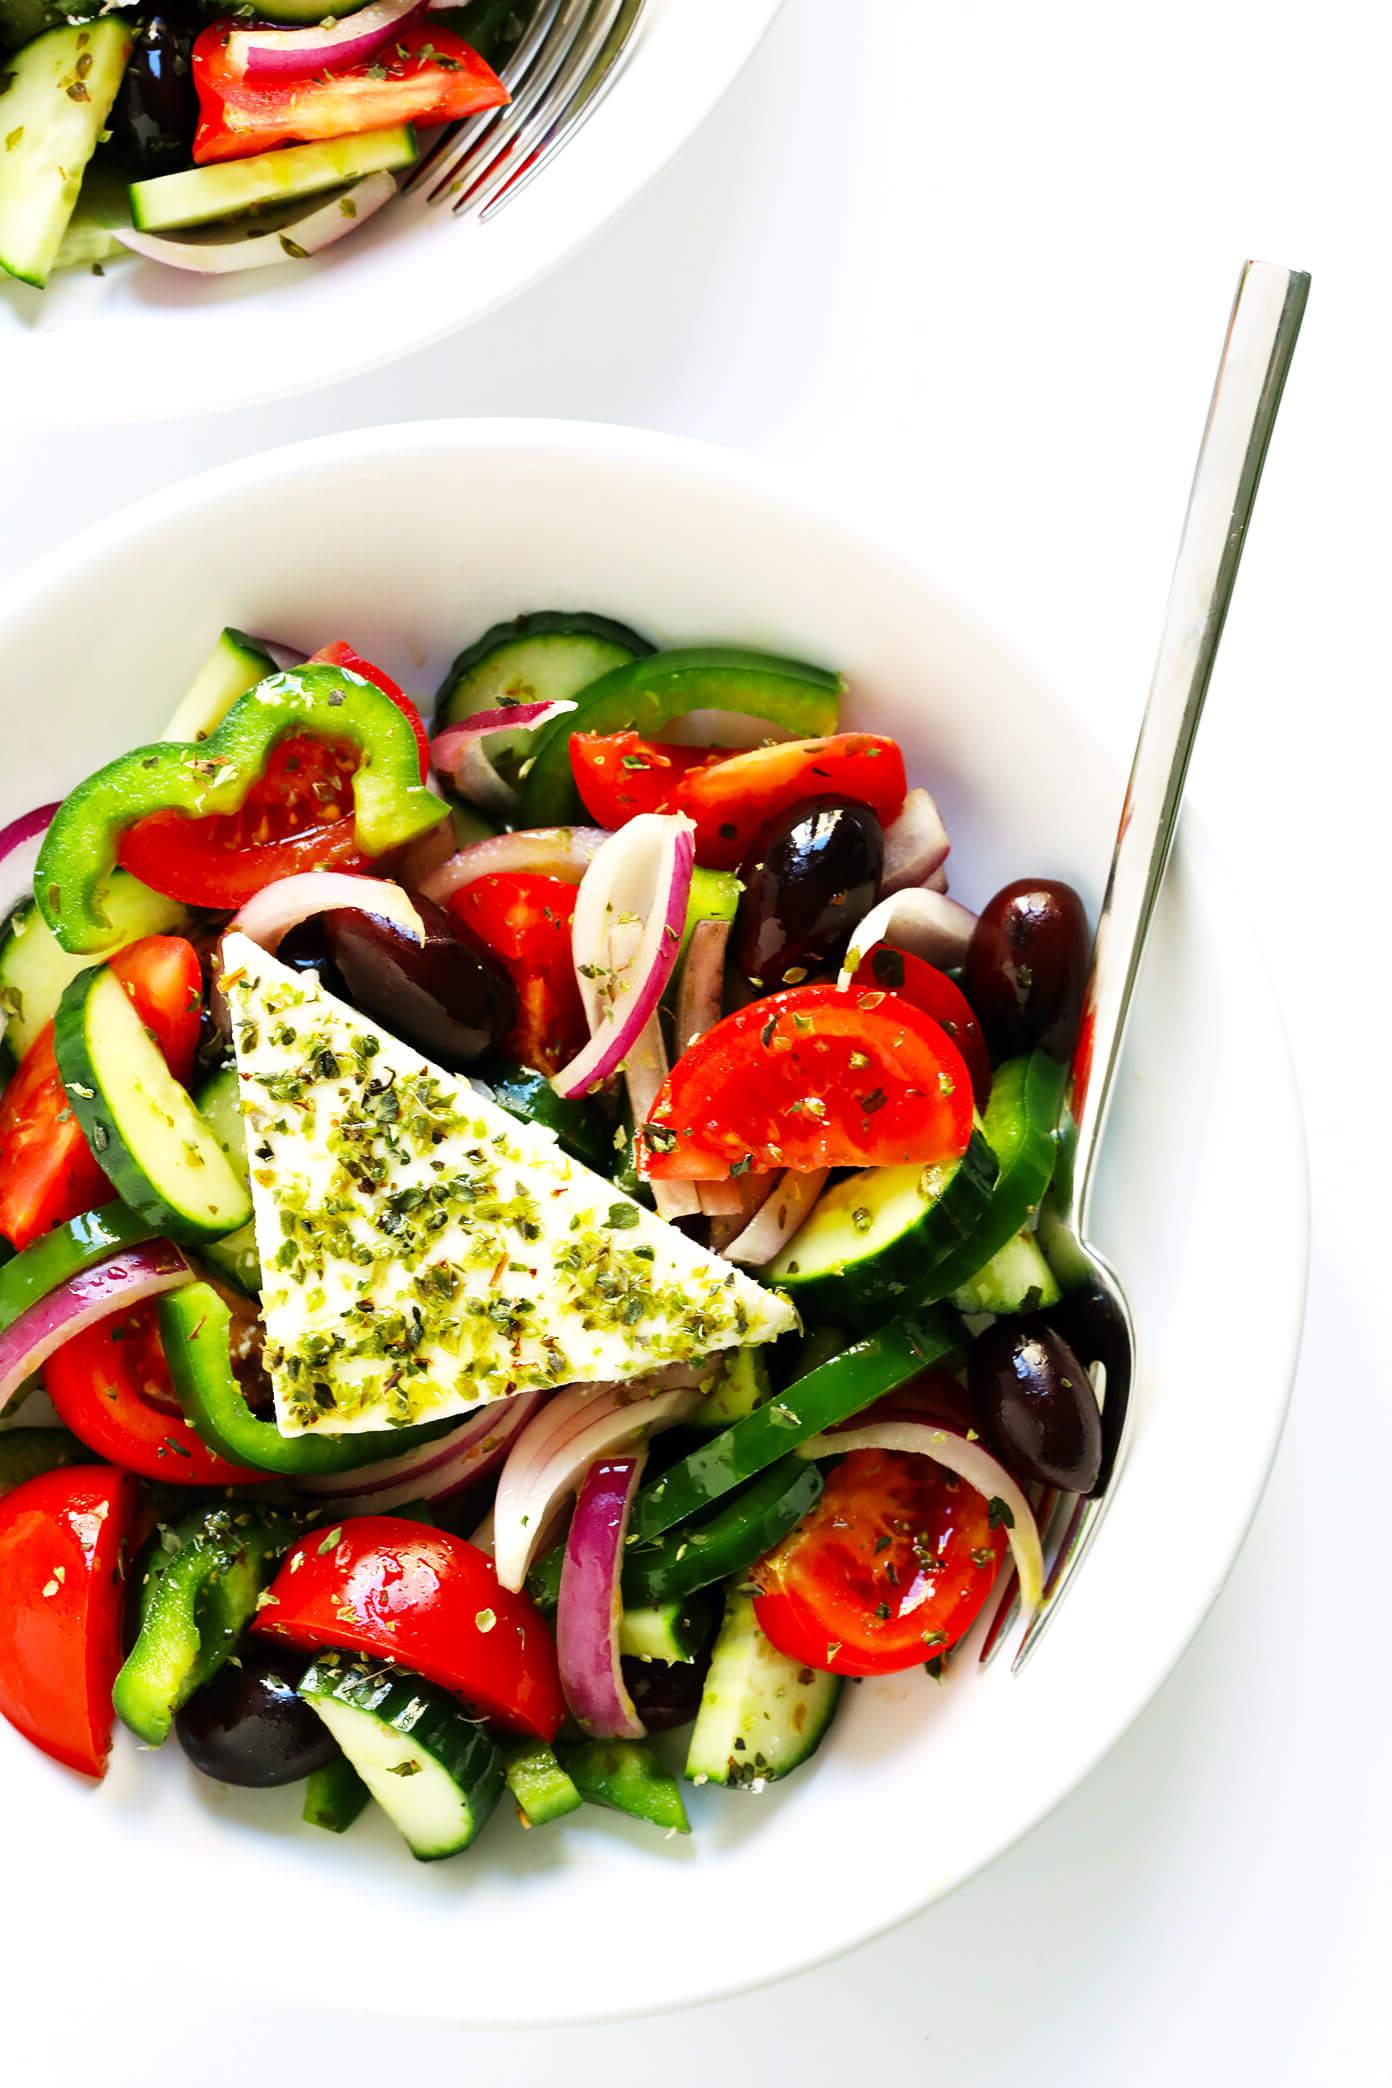 Notre délicieuse salade grecque